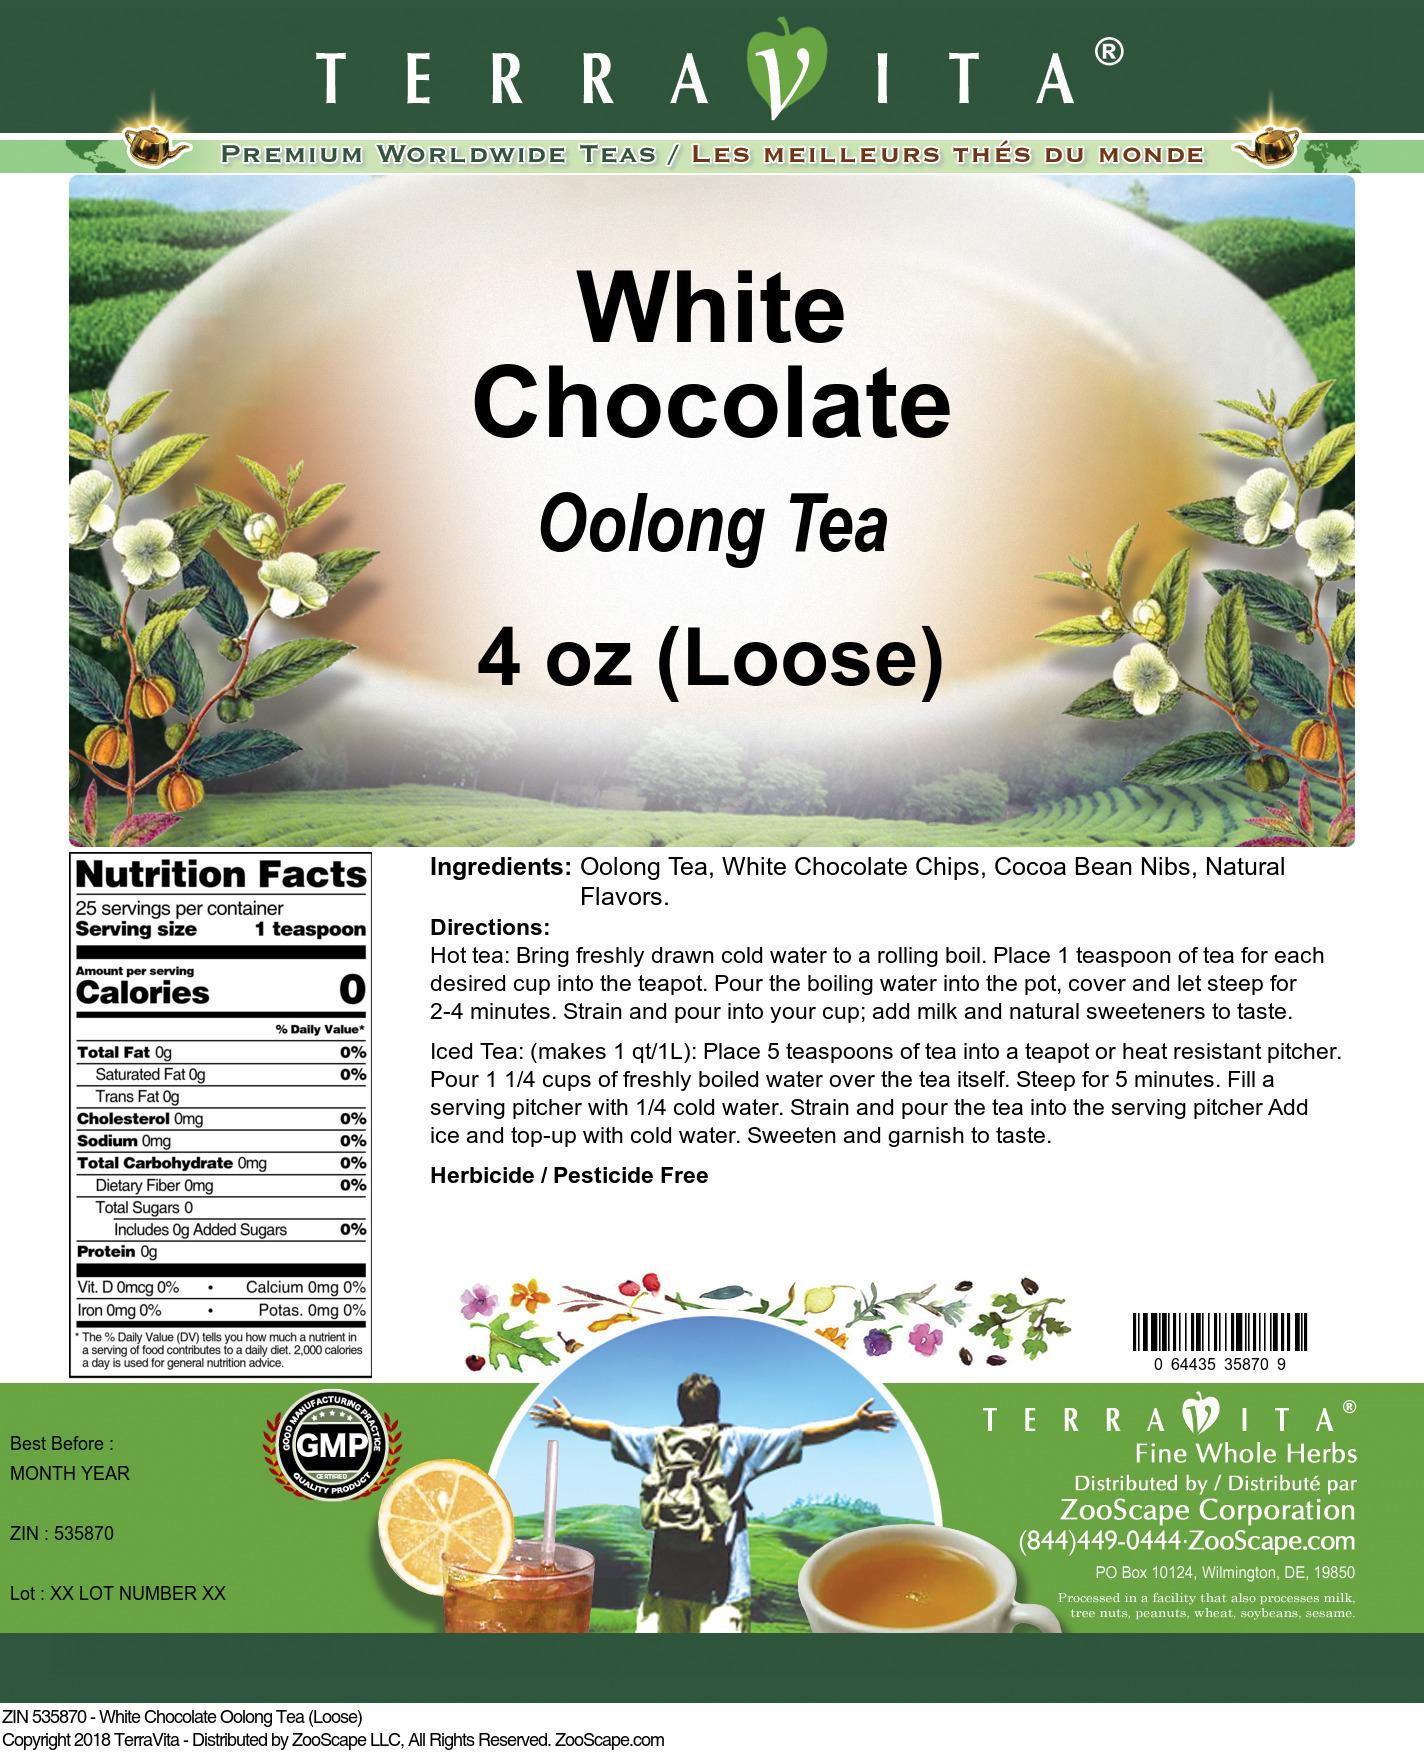 White Chocolate Oolong Tea (Loose)